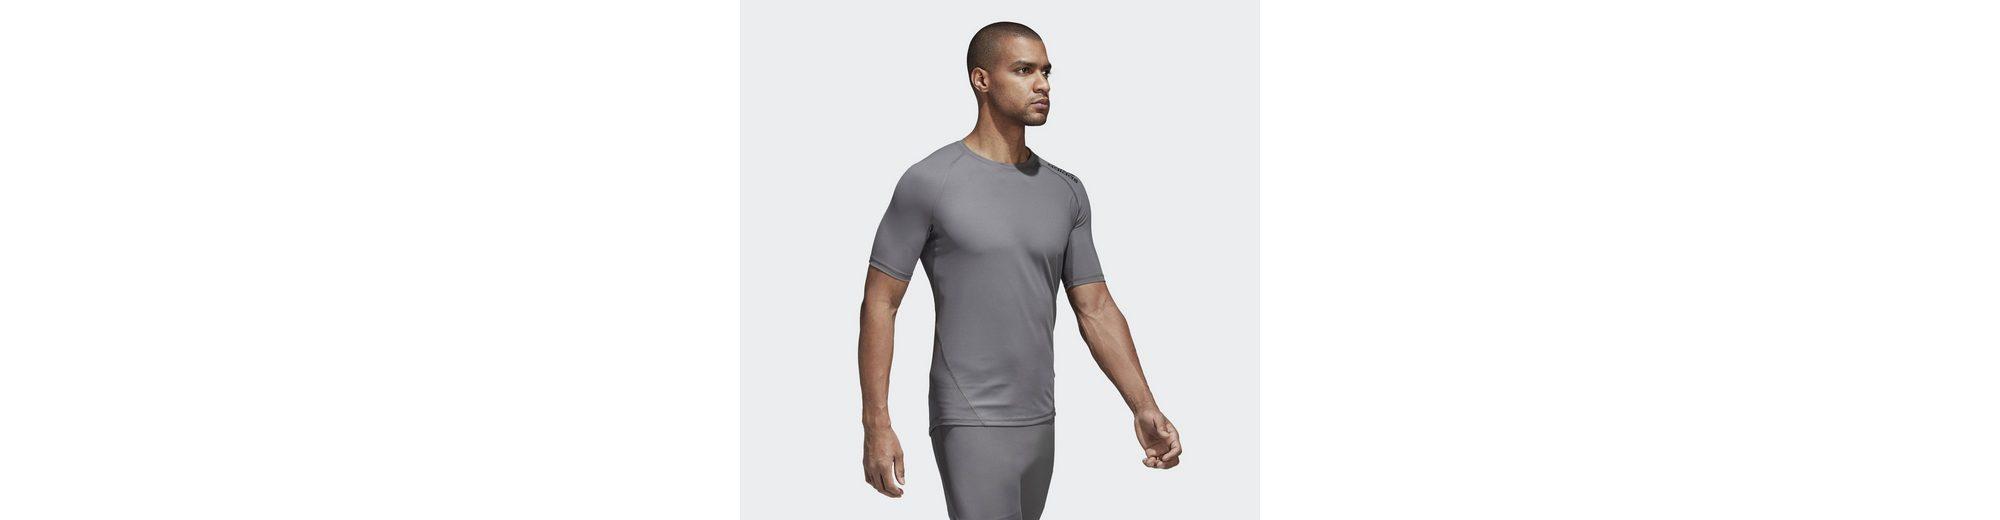 Beliebt Und Billig adidas Performance T-Shirt Alphaskin Sport T-Shirt 2018 Auslaß WA6OQDj